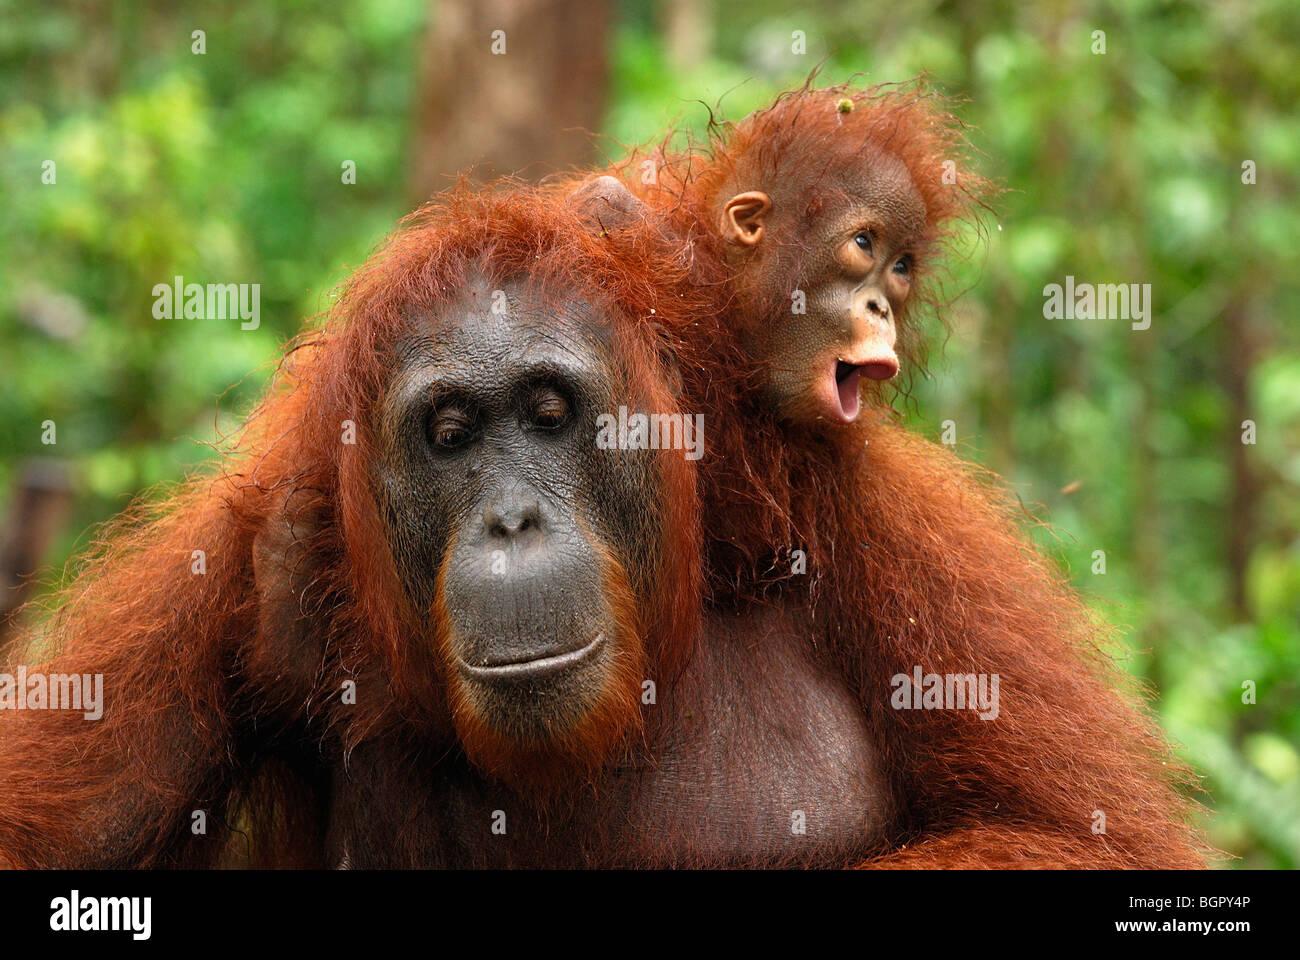 L'orang-outan de Bornéo (Pongo pygmaeus), femme avec son bébé à cheval sur son dos, Kalimantan, Photo Stock